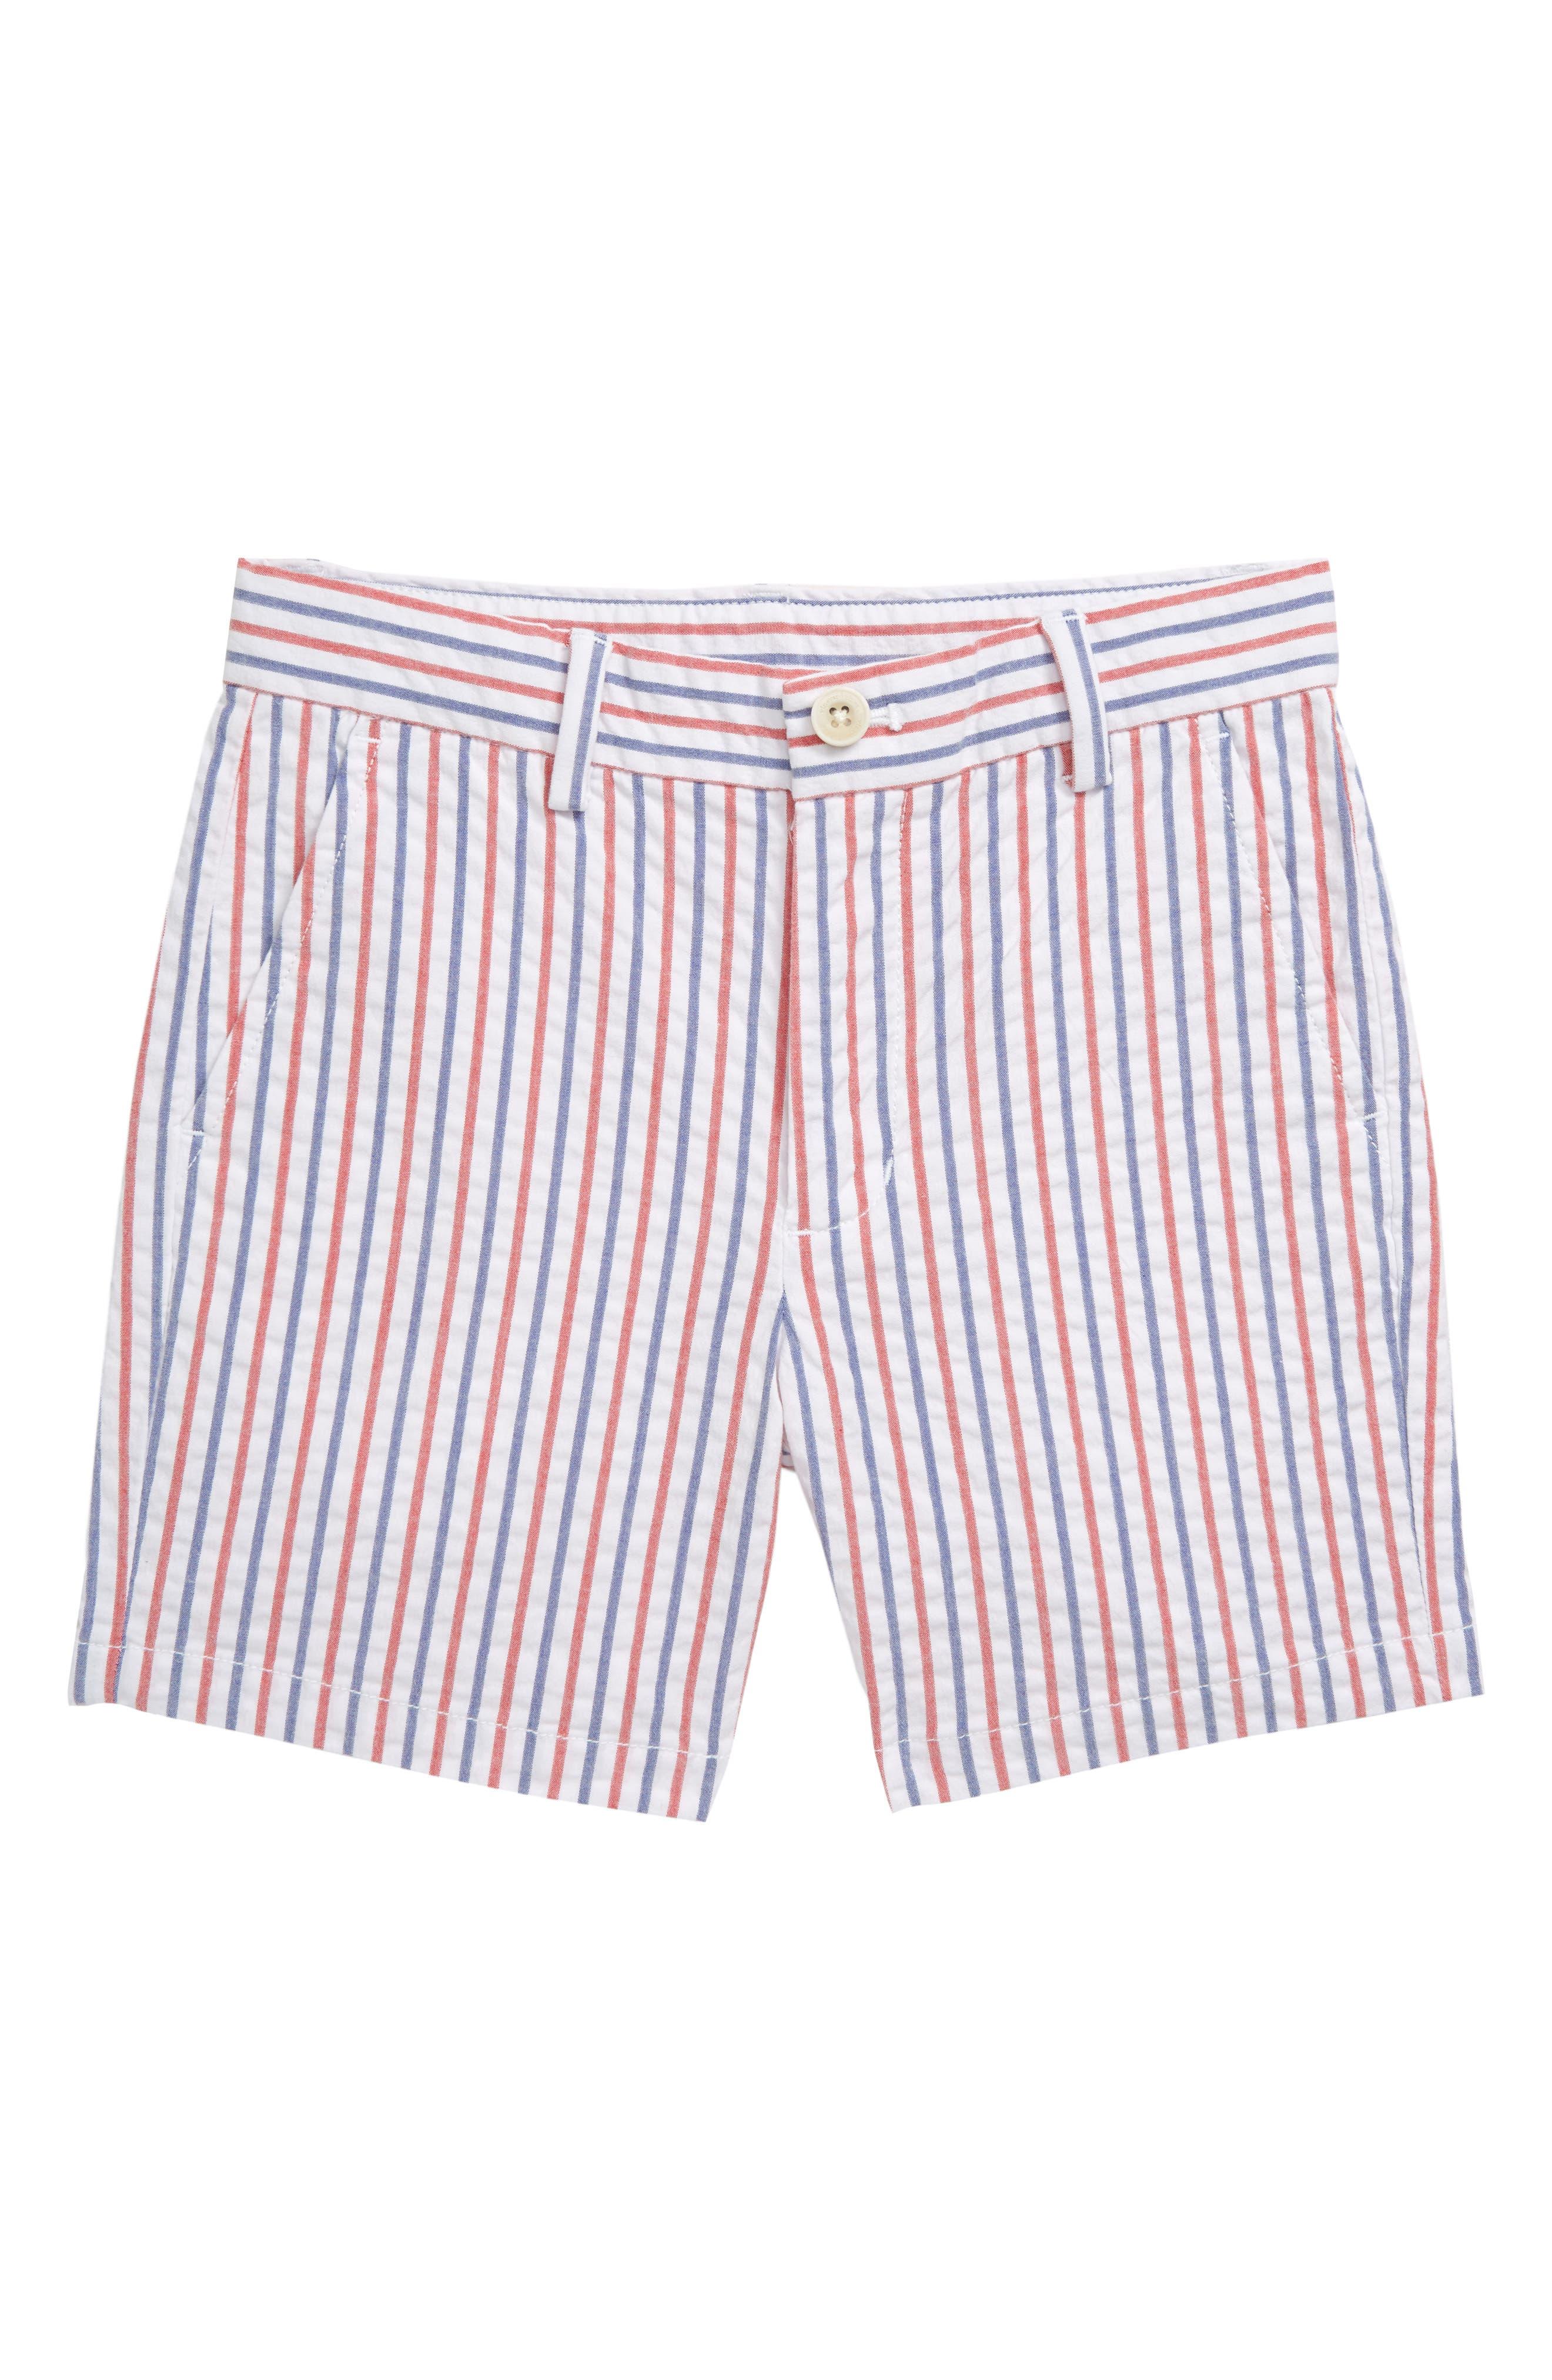 Toddler Boys Vineyard Vines Firework Stripe Seersucker Breaker Shorts Size 3T  Red